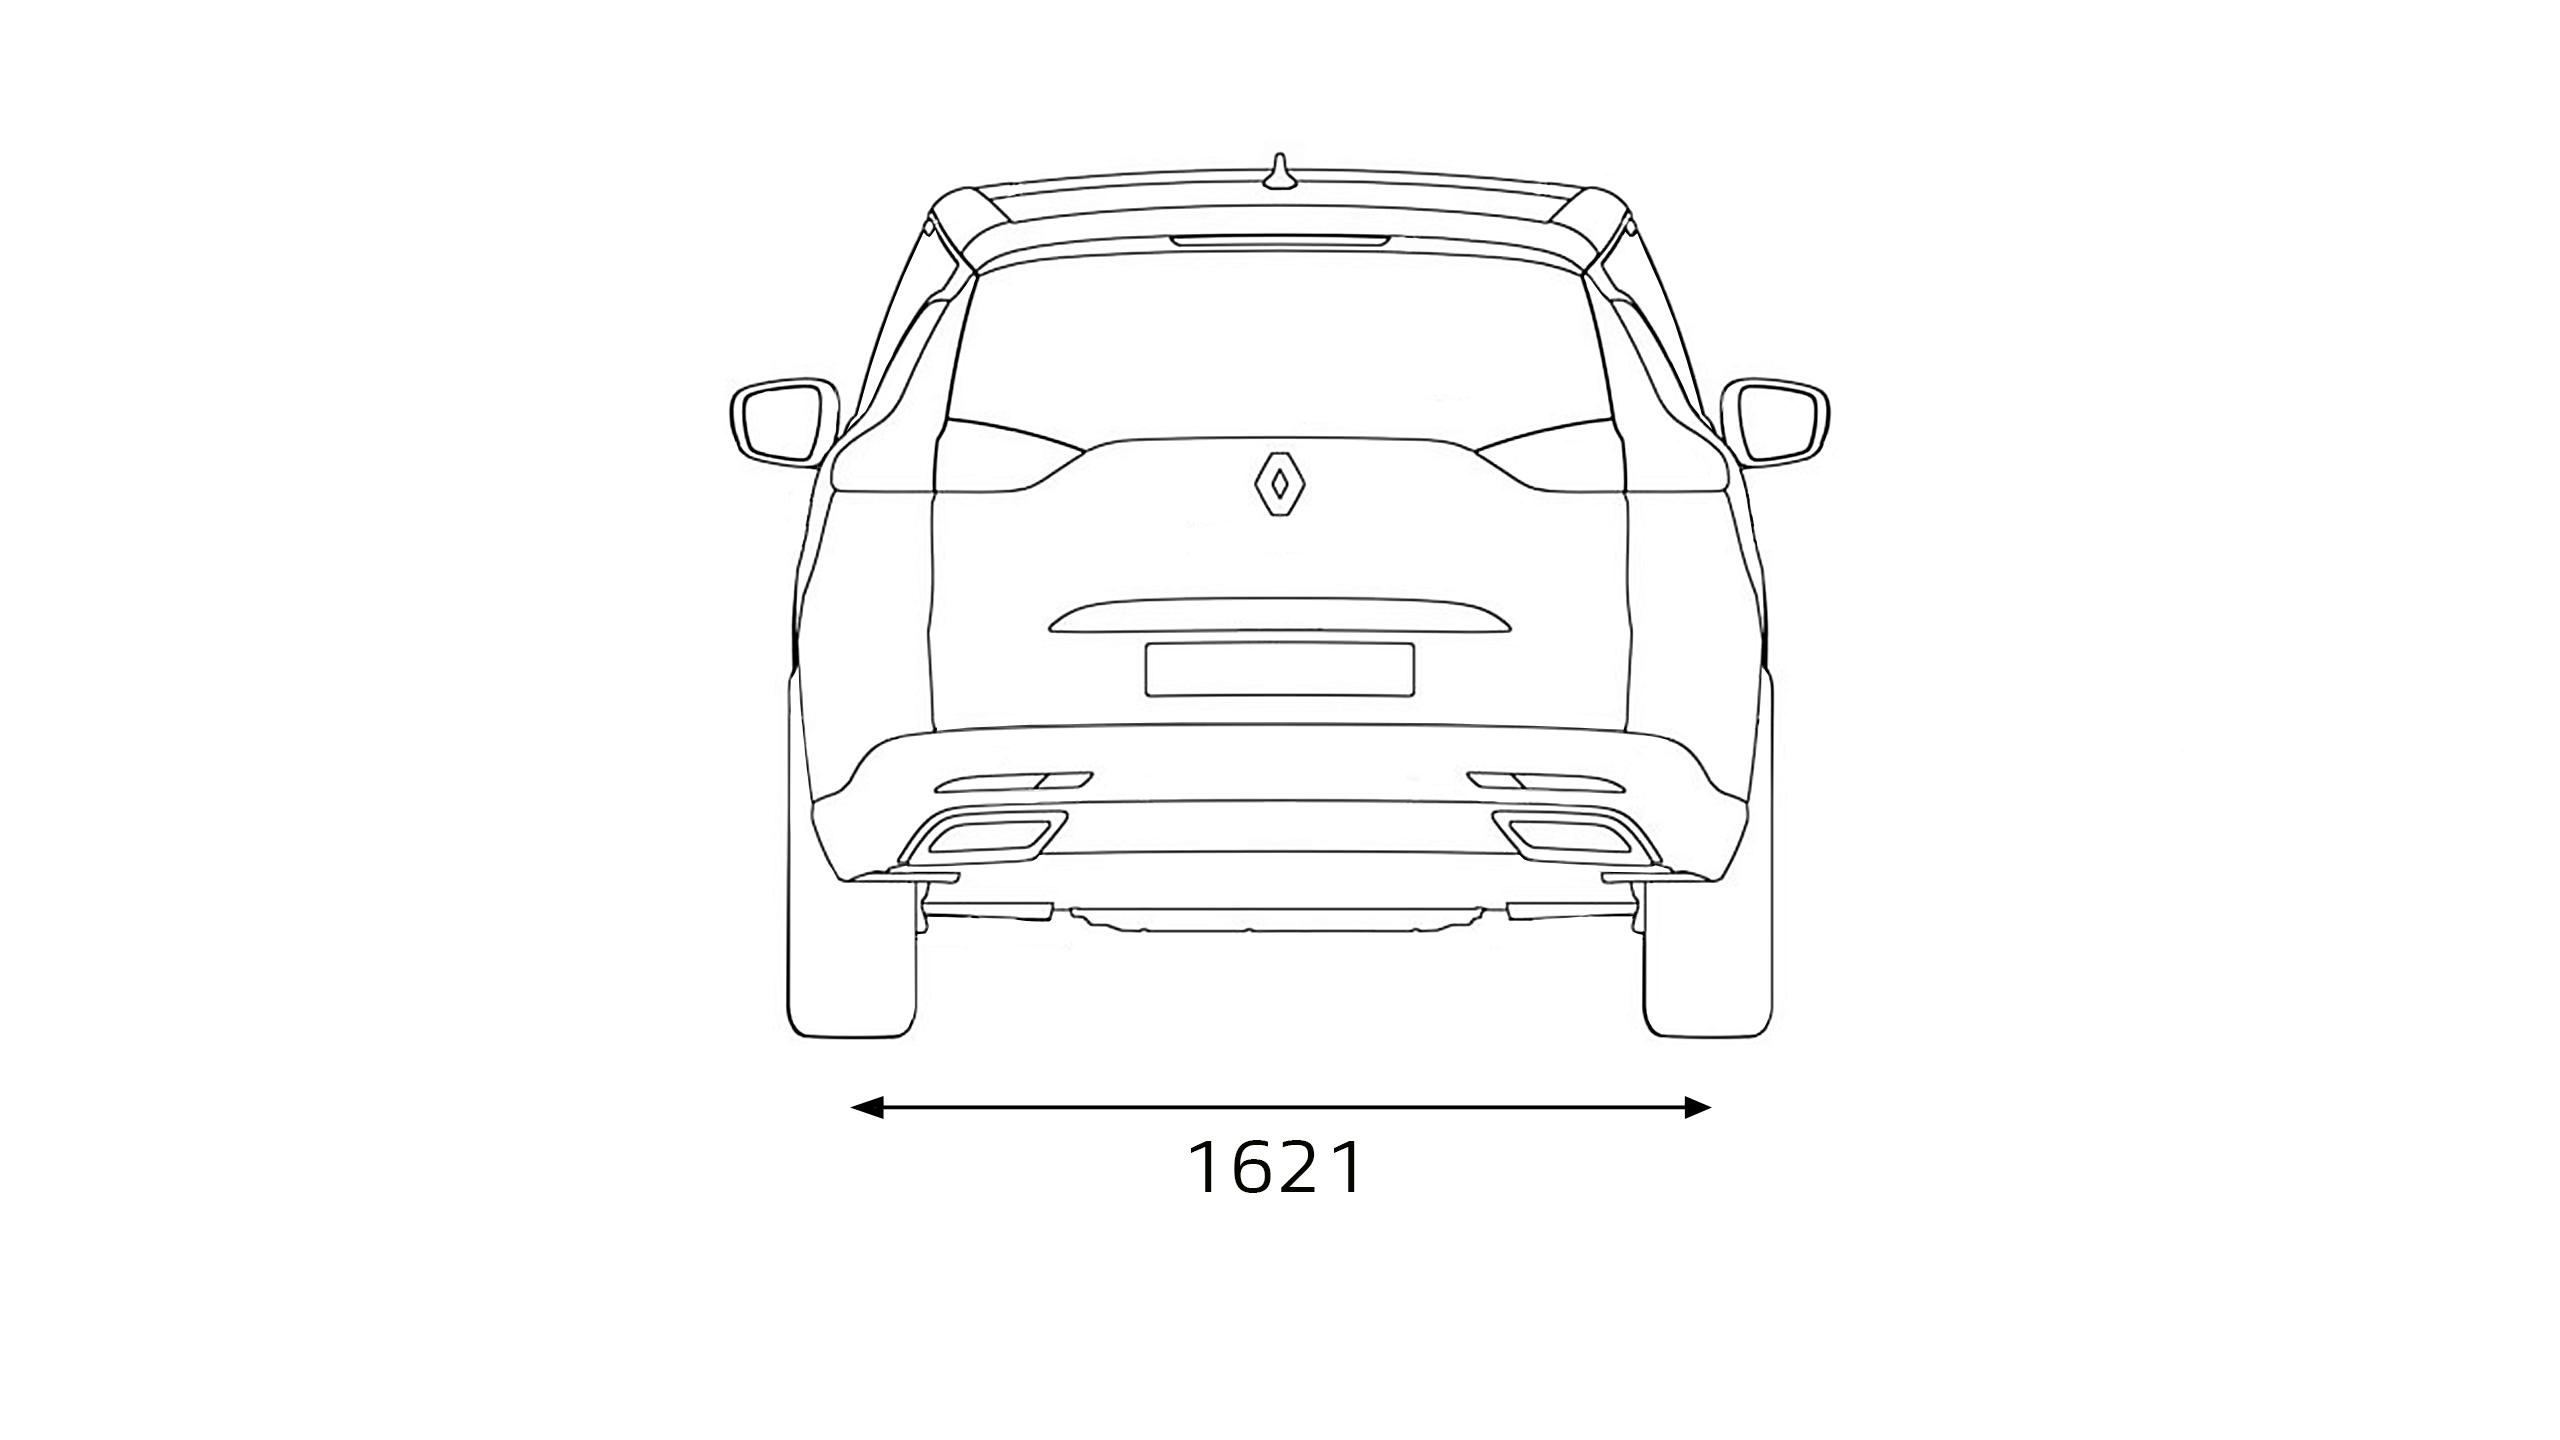 Renault Espace Autozentren P&A-Preckel